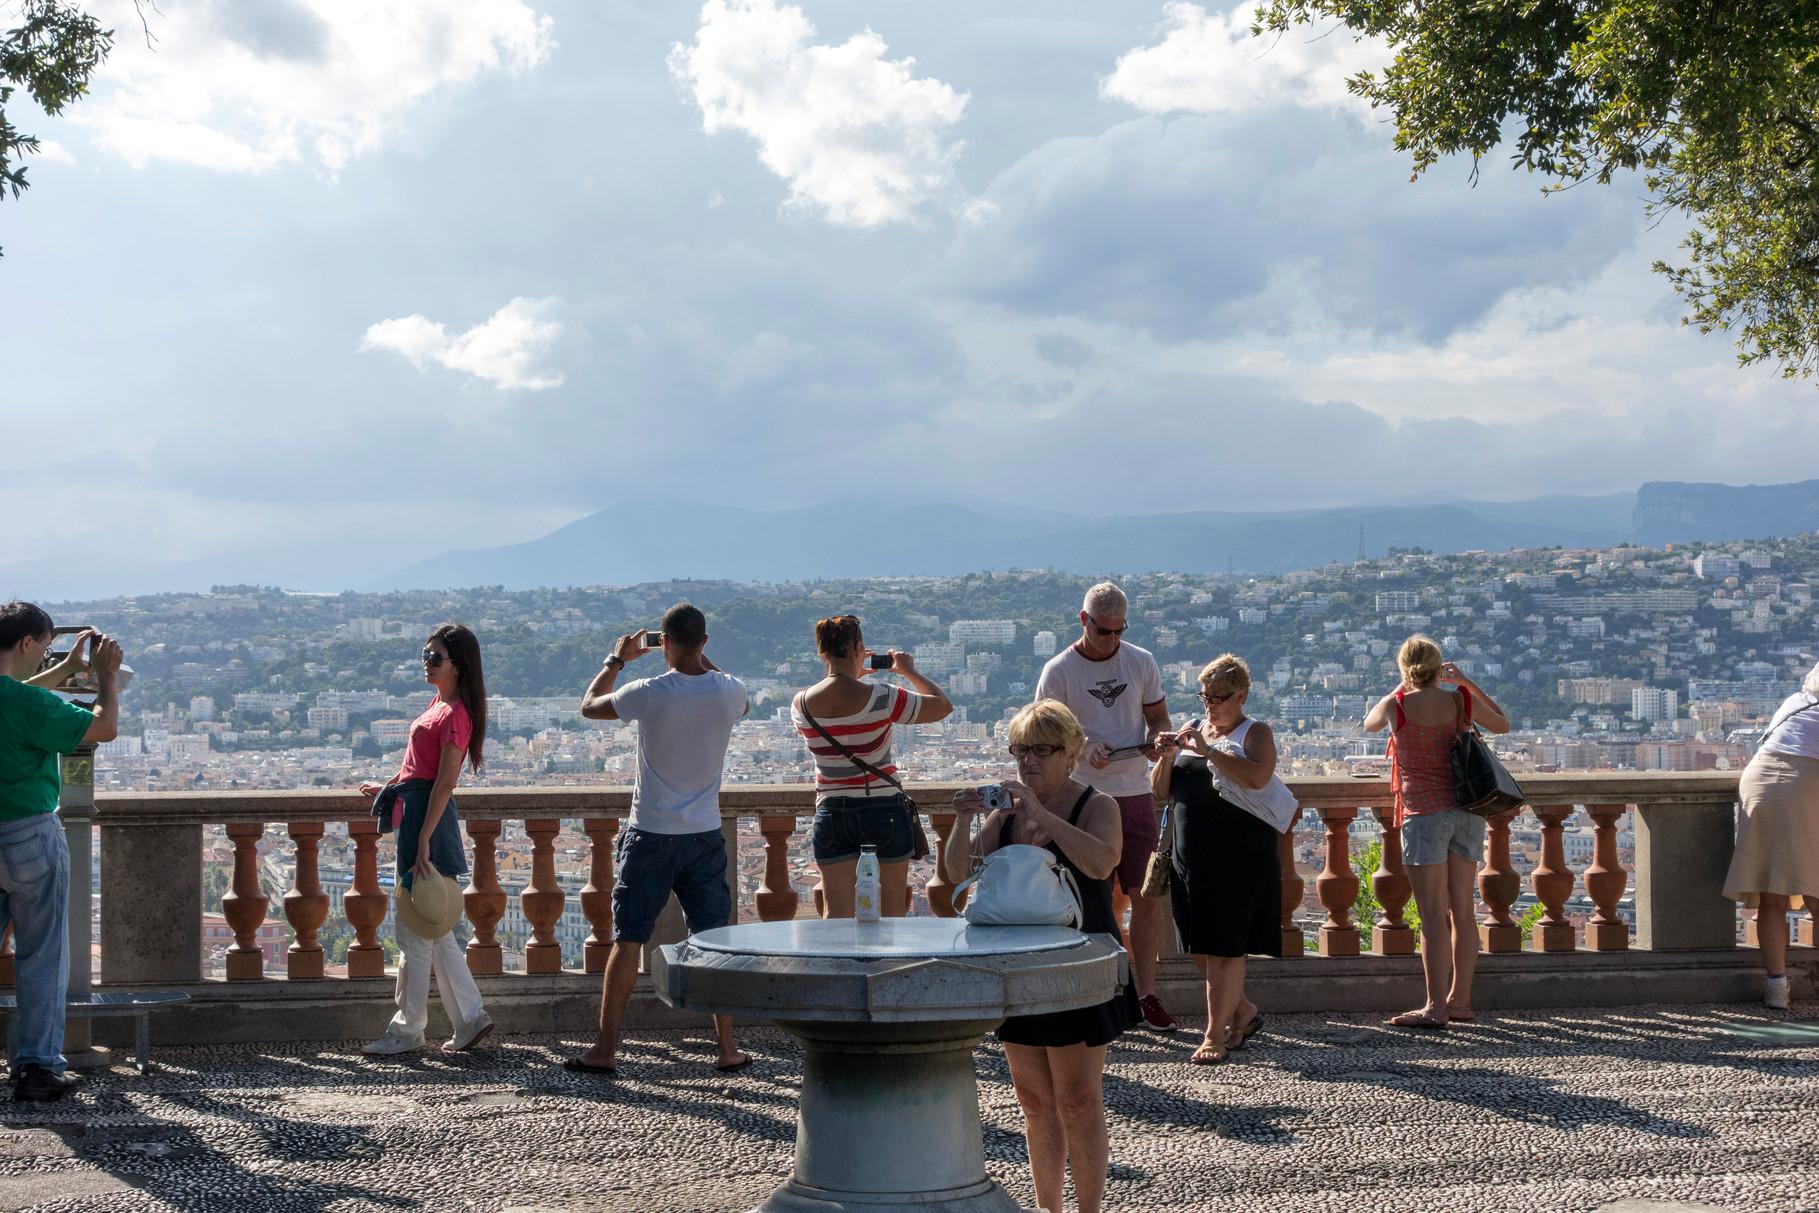 Touristen am Aussichtspunkt Colline du Chateau